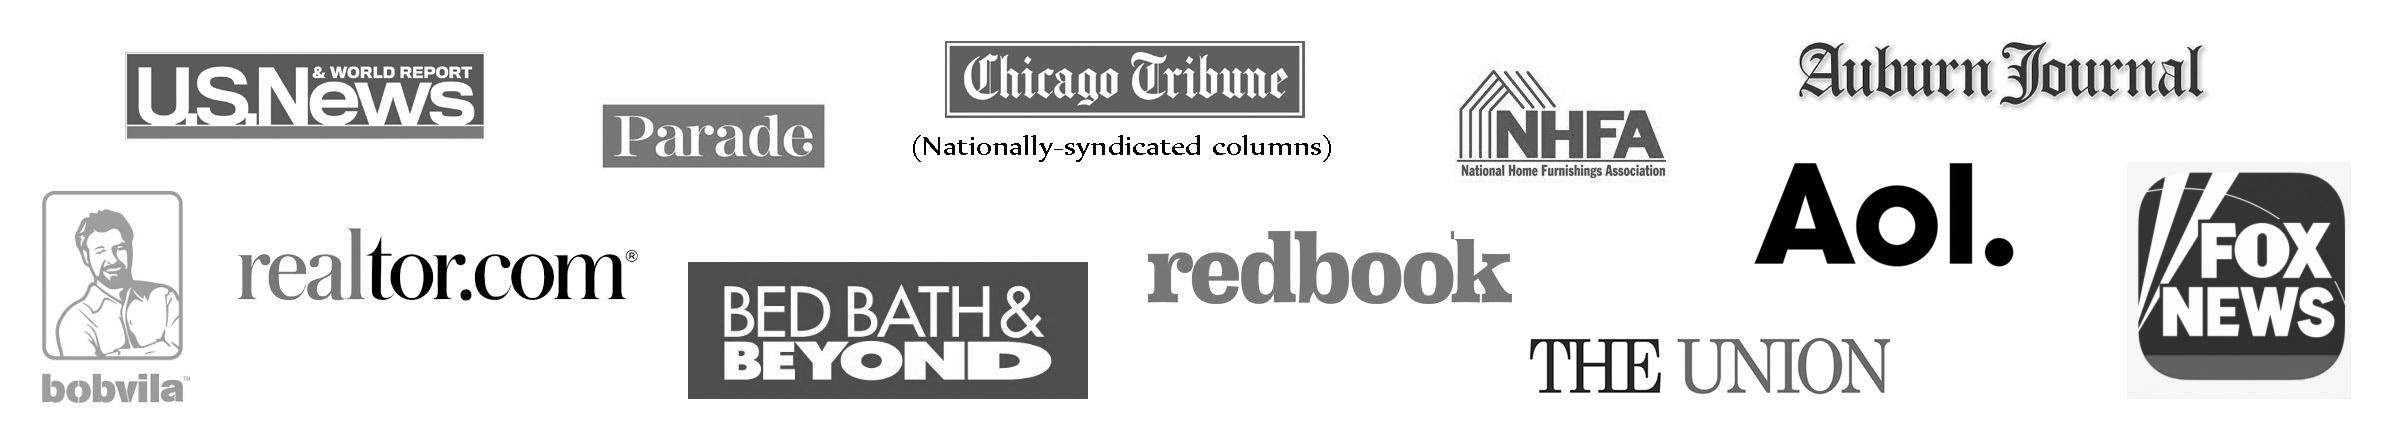 Sam Jernigan has been quoted as an interior design expert in national media including Realtor.com, Bed bath & beyond, US News, Chicago Tribune, Parade, Redbook, Fox News, BobVila.com, The Union Newspaper, Auburn Journal, et al.